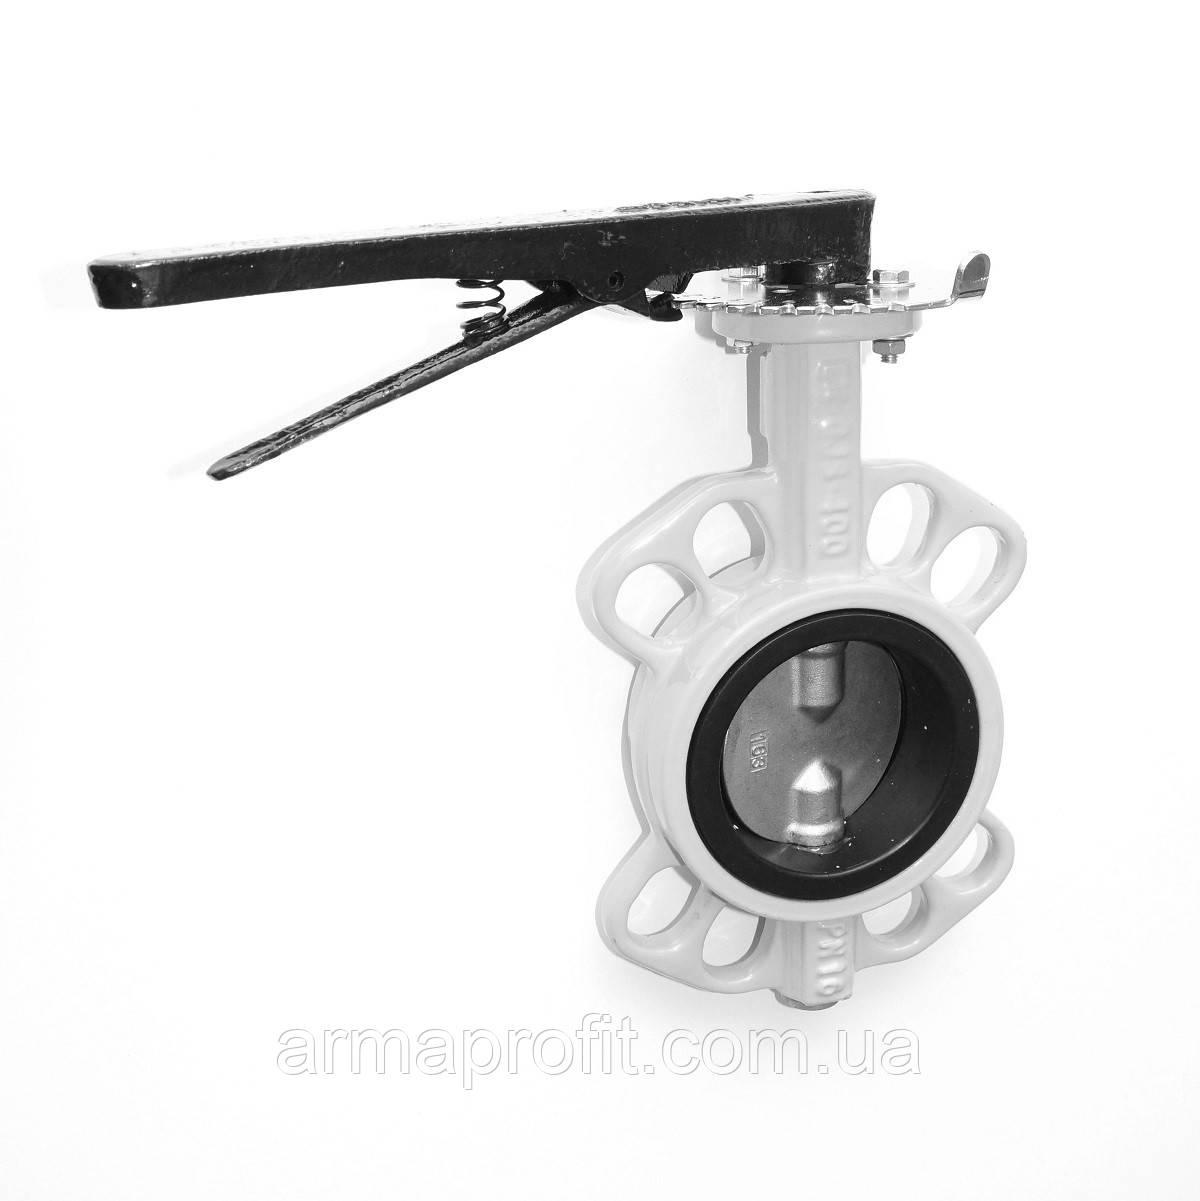 Задвижка поворотная Баттерфляй для газа RBV-16-40(G) (P204) Ду400 Ру16 с редуктором